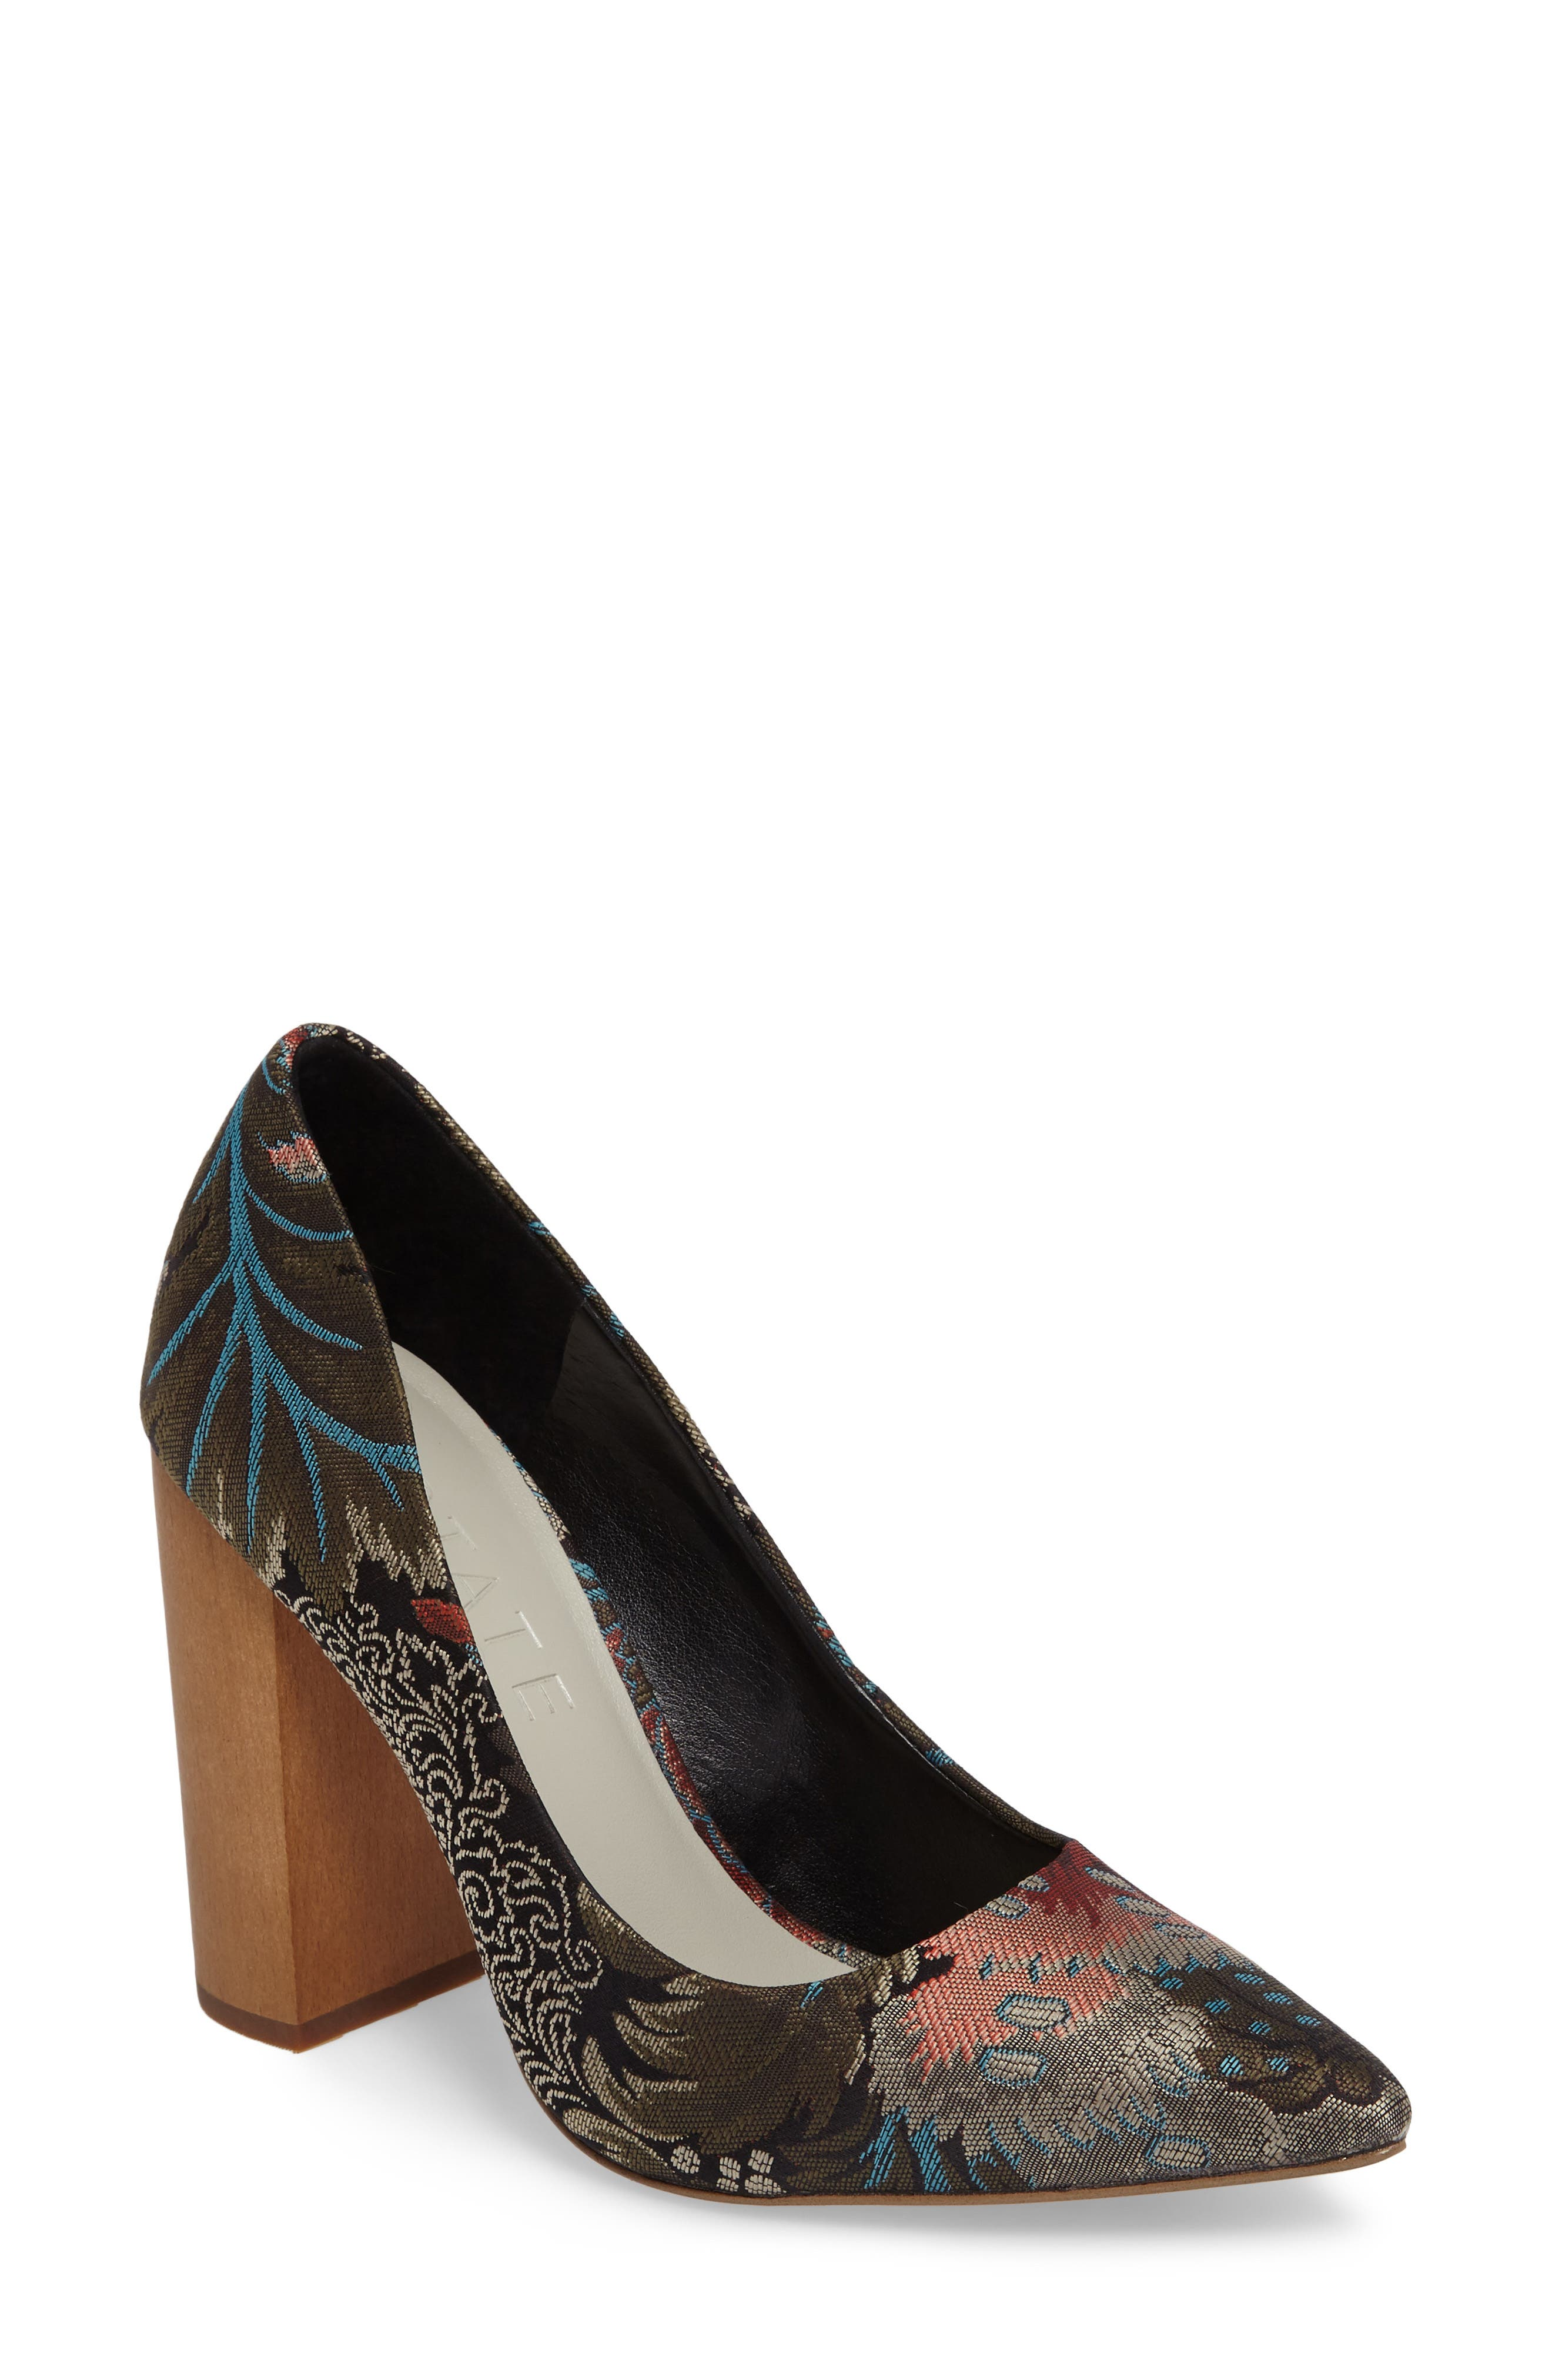 Main Image - 1.STATE Valencia Block Heel Pump (Women)